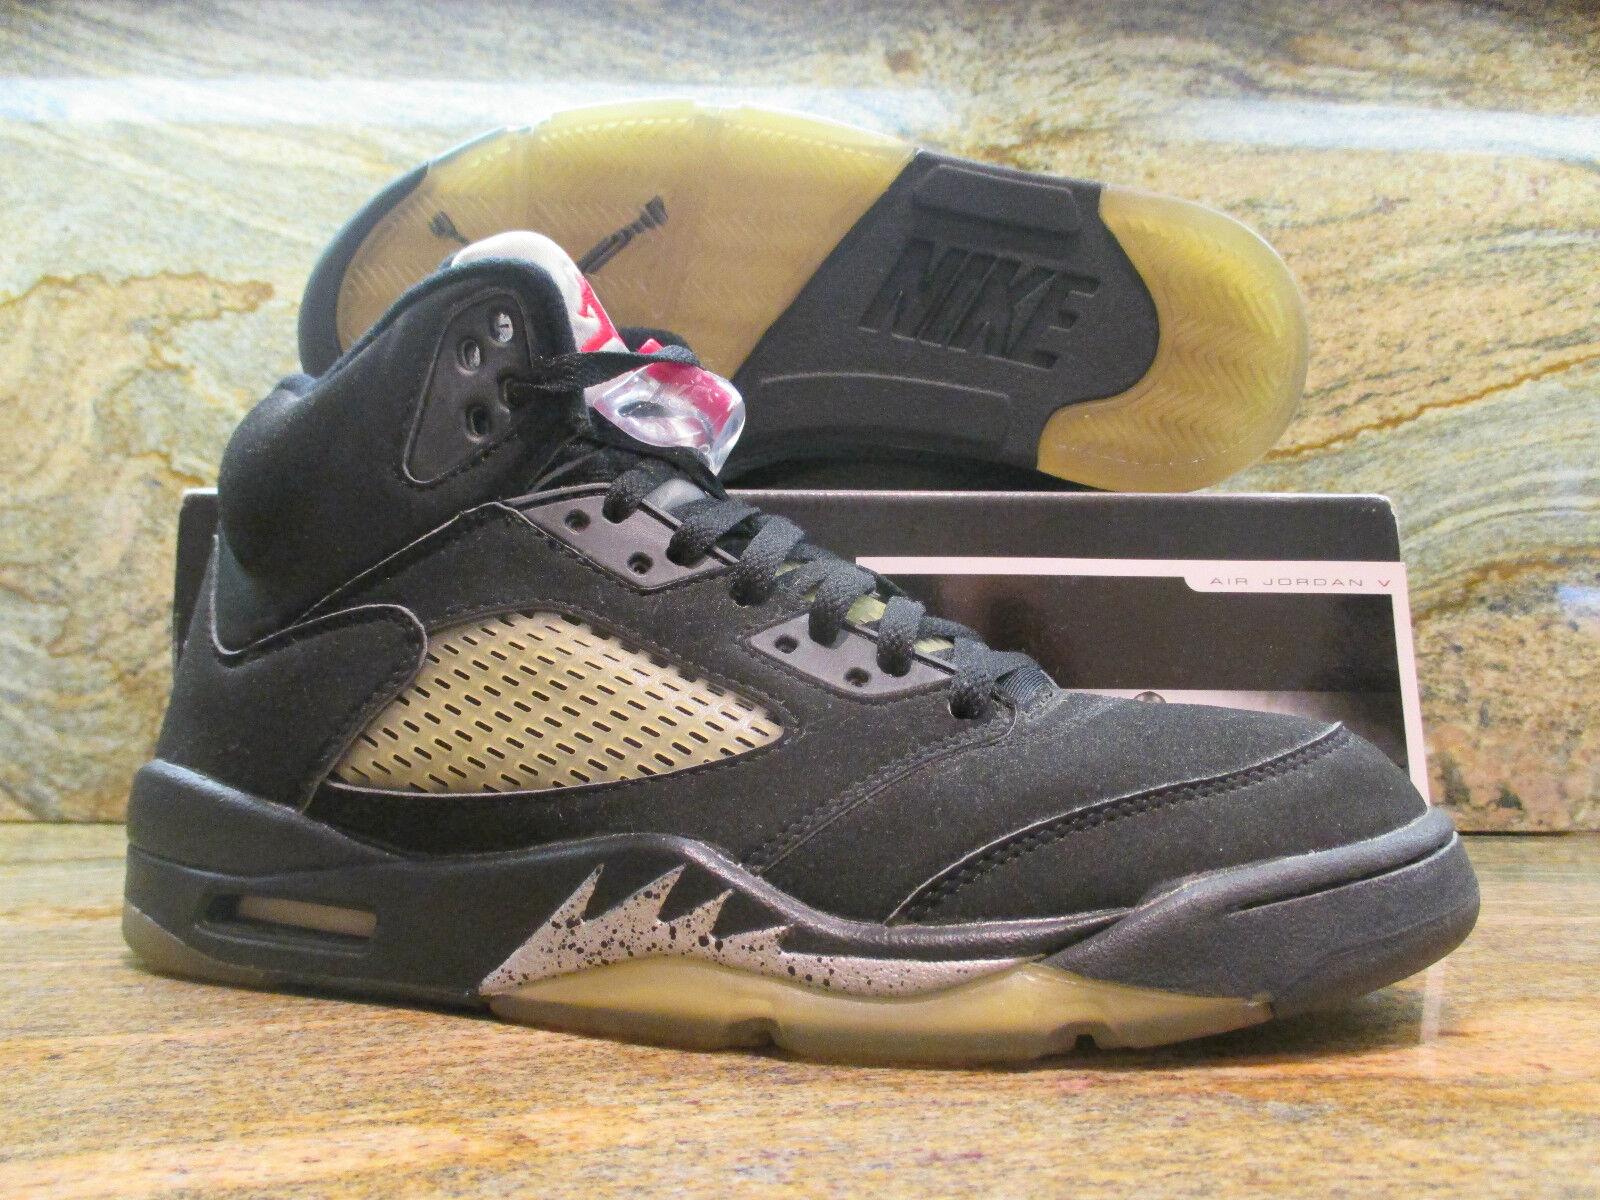 1999 Nike Air Jordan V 5 Retro OG SZ 9.5 Black Metallic Silver BIN 136027-001